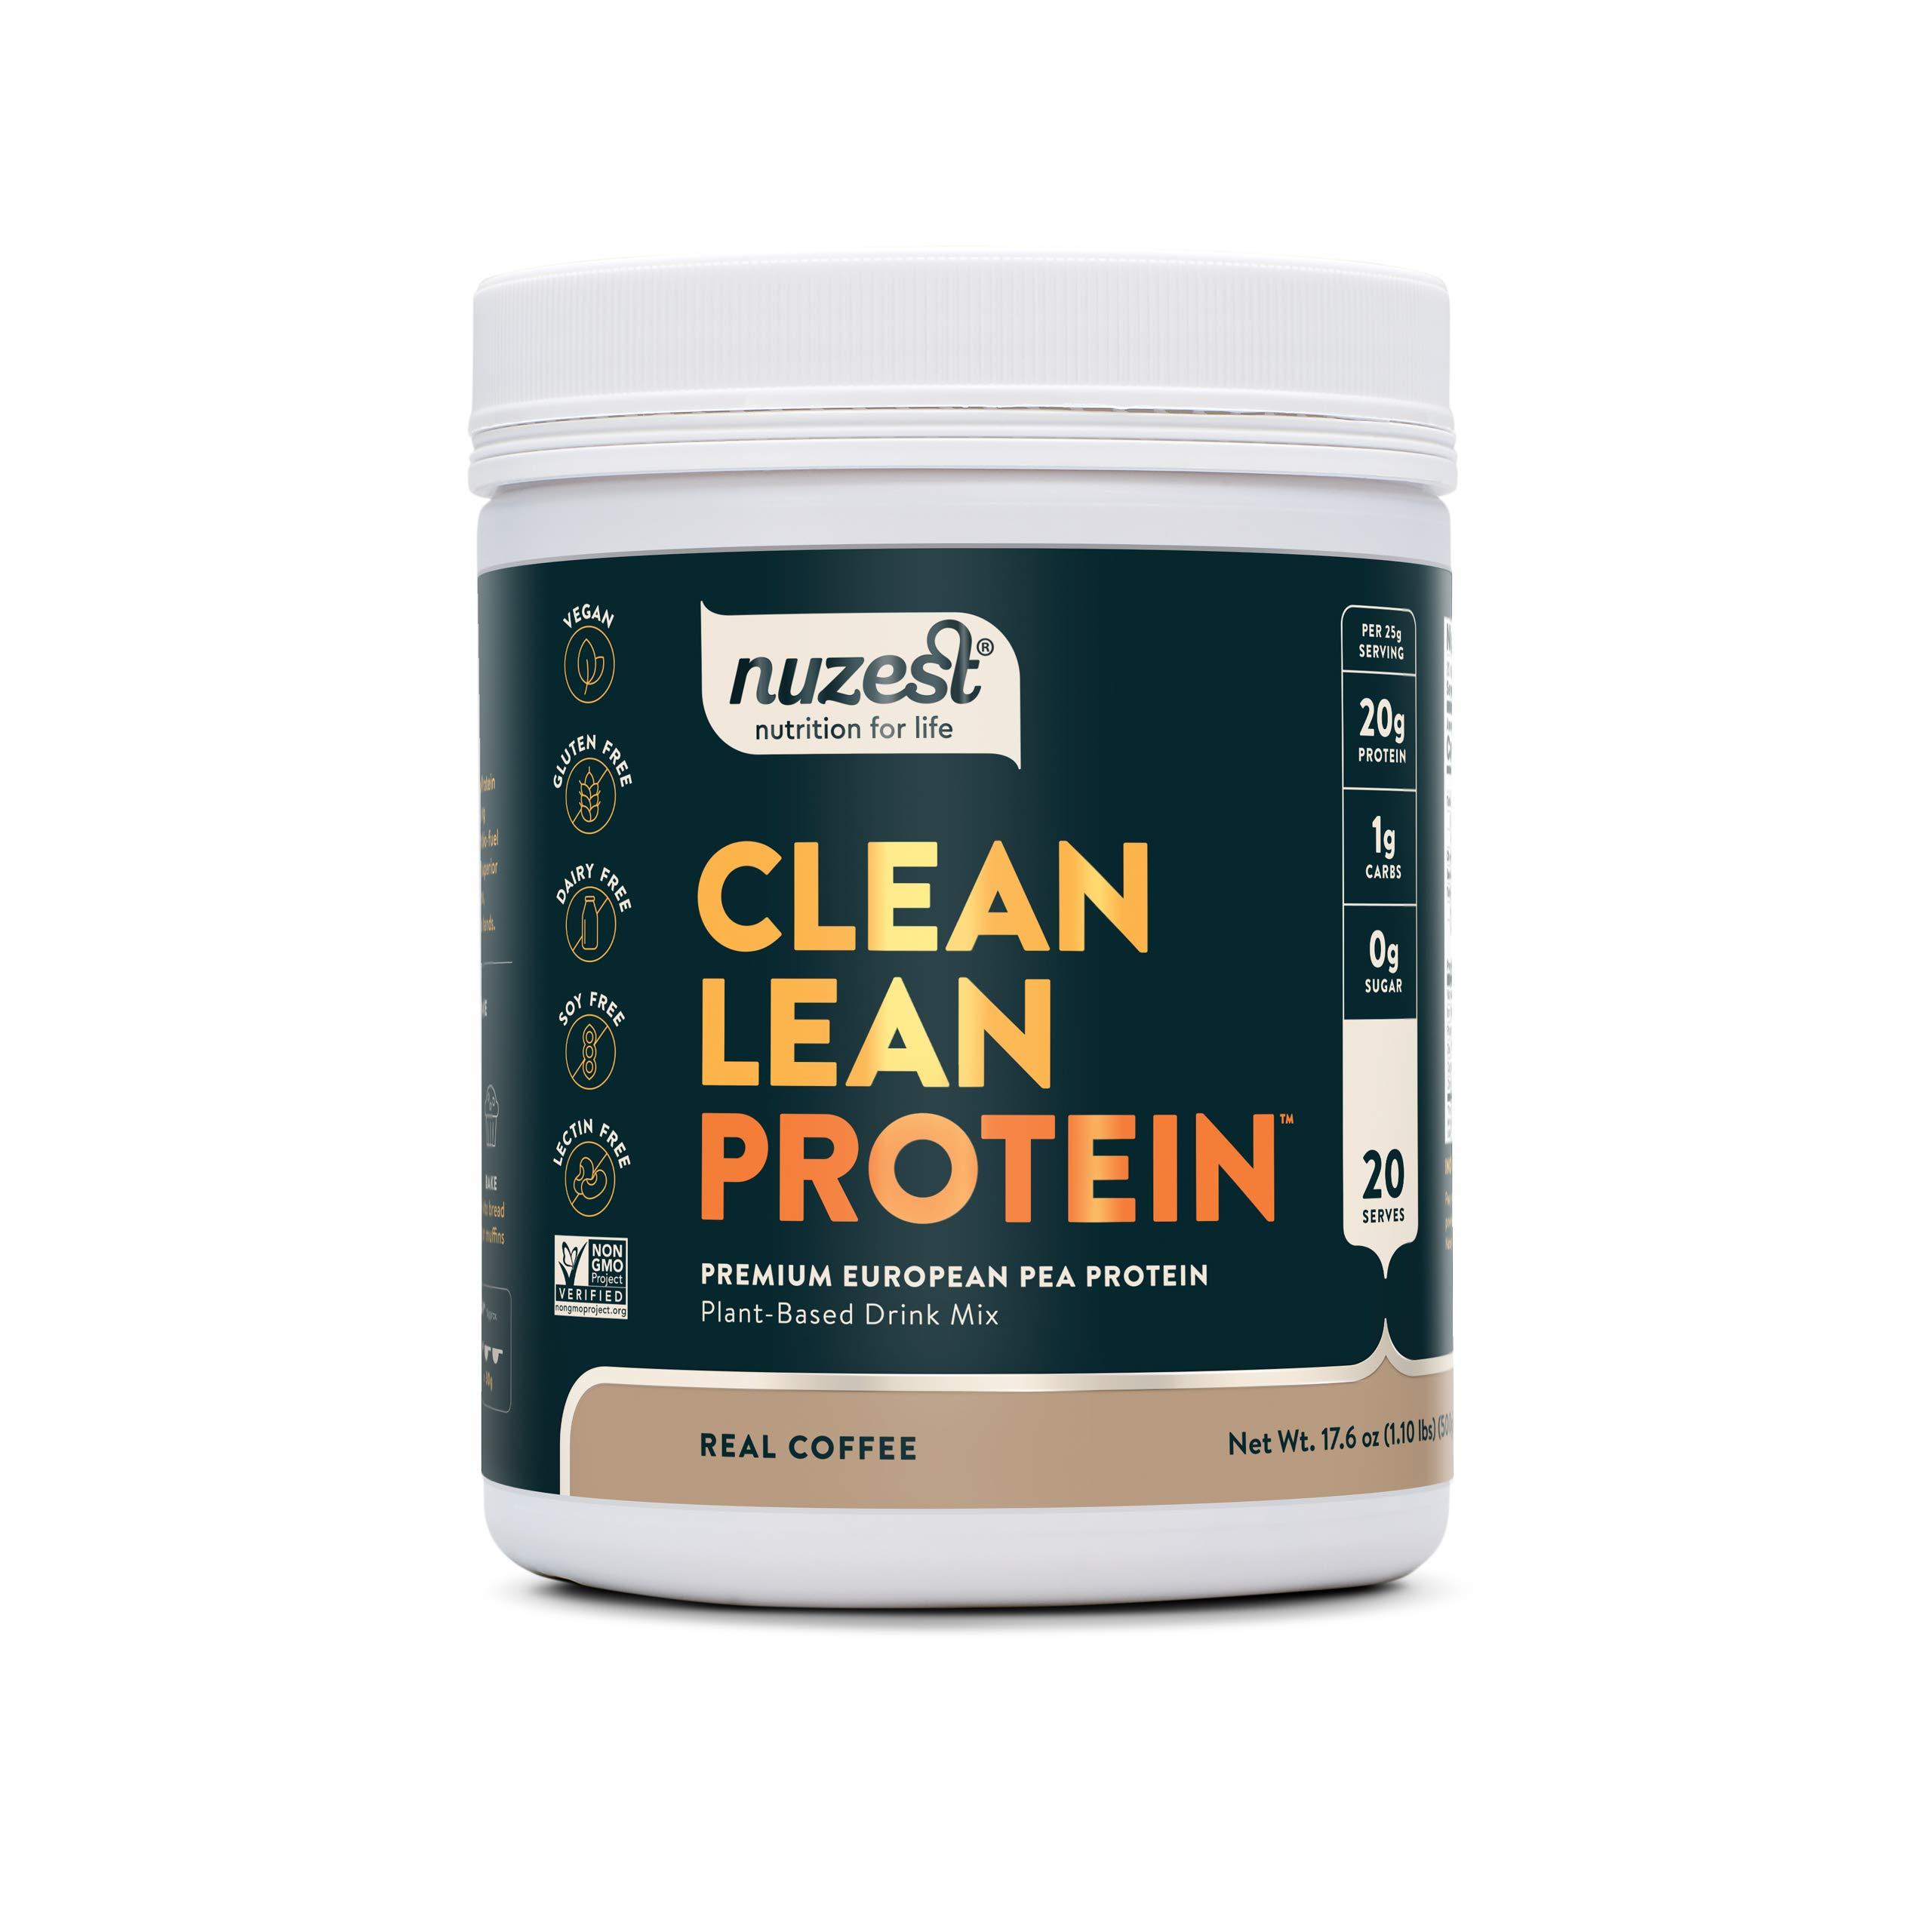 Nuzest Clean Lean Protein - Premium Vegan Protein Powder, Plant Protein Powder, European Golden Pea Protein, Dairy Free, Gluten Free, GMO Free, Naturally Sweetened, Real Coffee, 20 Servings, 1.1 lb